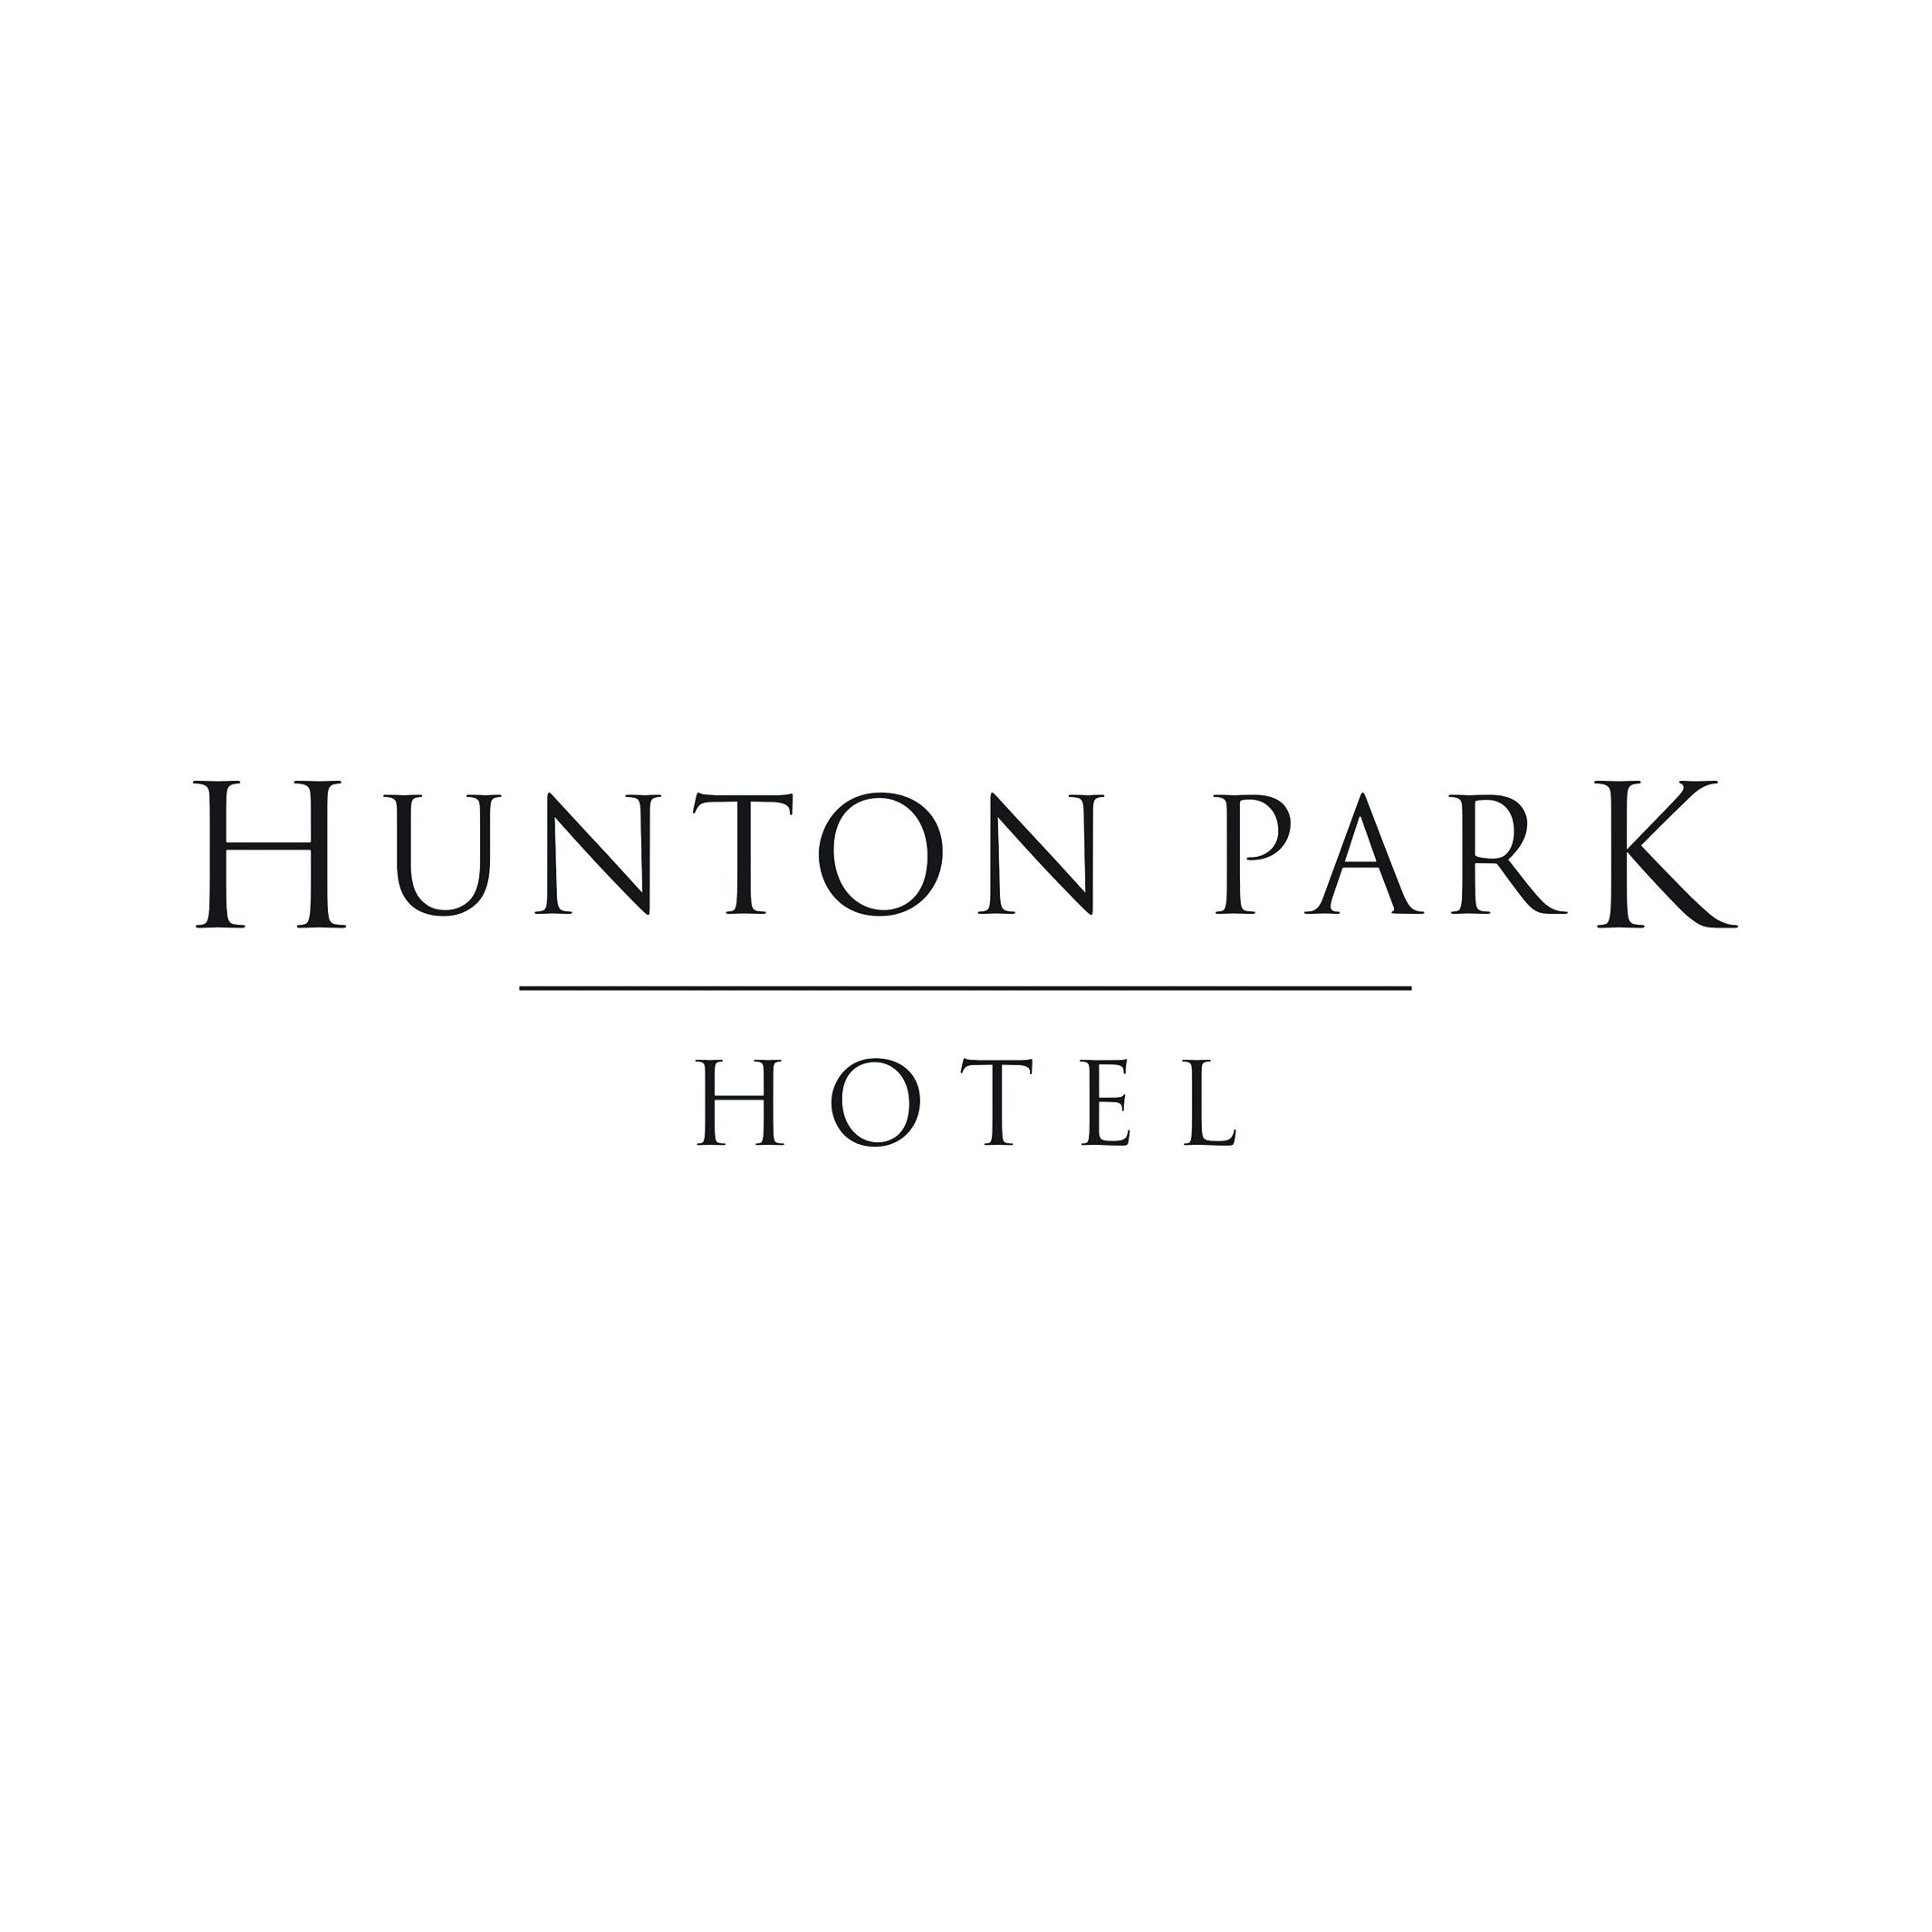 Hunton Park Hotel